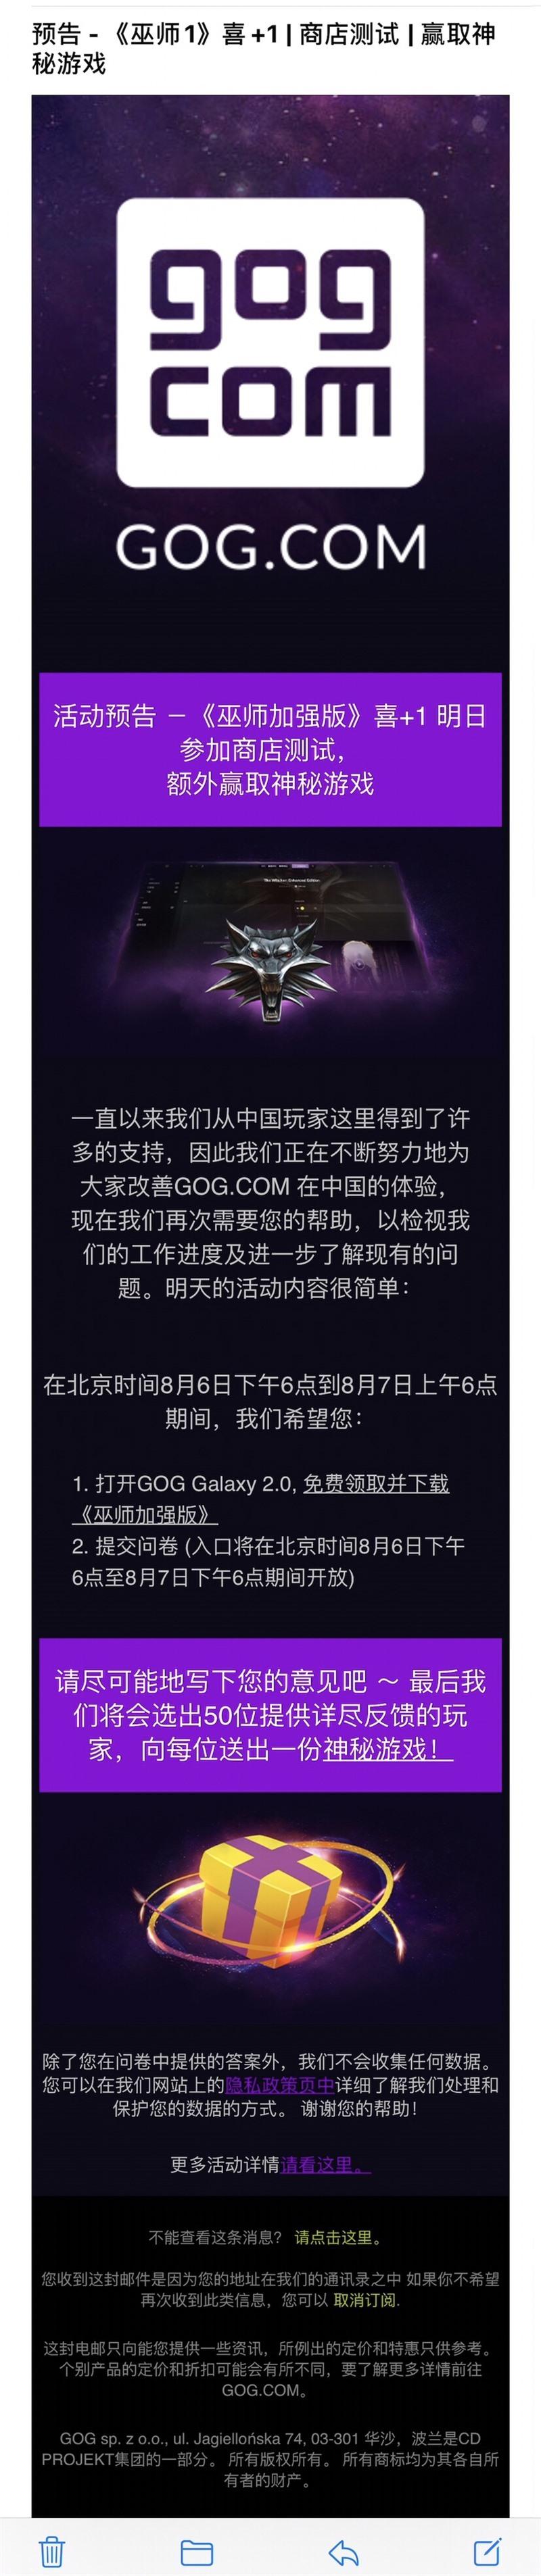 GOG官方宣布Galaxy 2.0 平台可免费领取《巫师加强版》